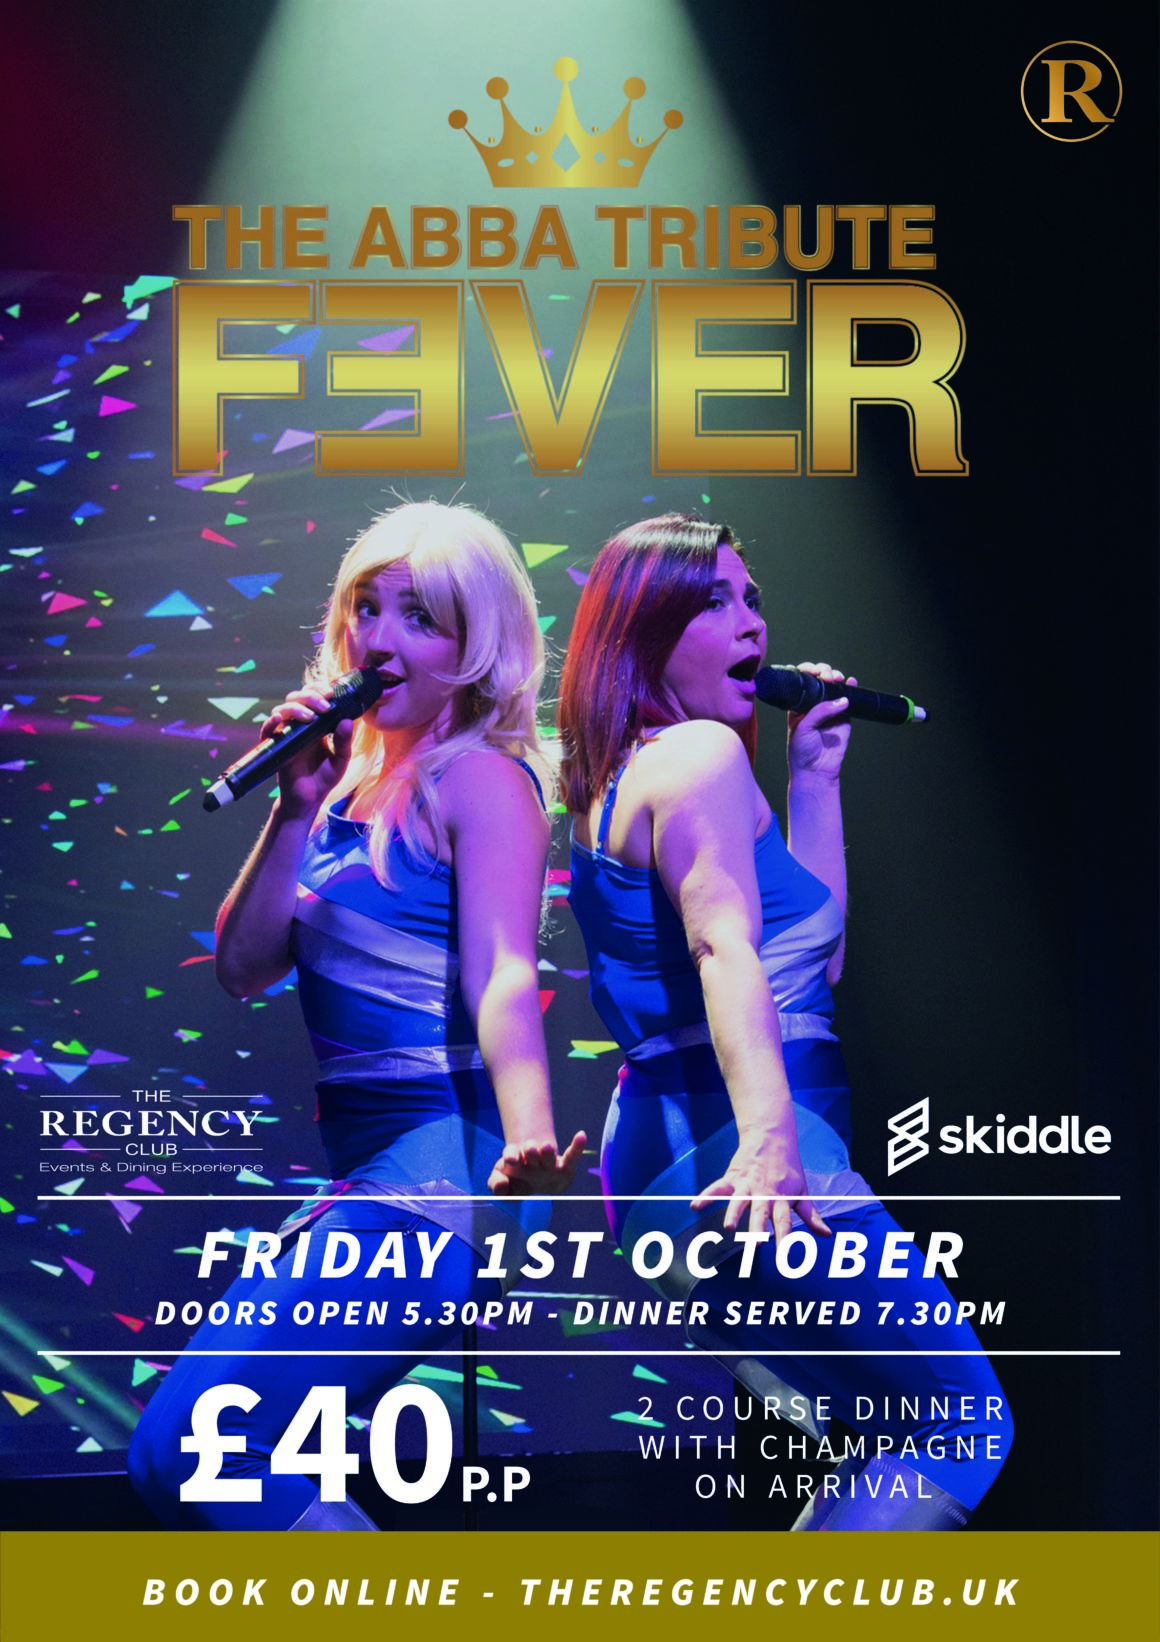 The ABBA Tribute FEVER – Fri 1 Oct